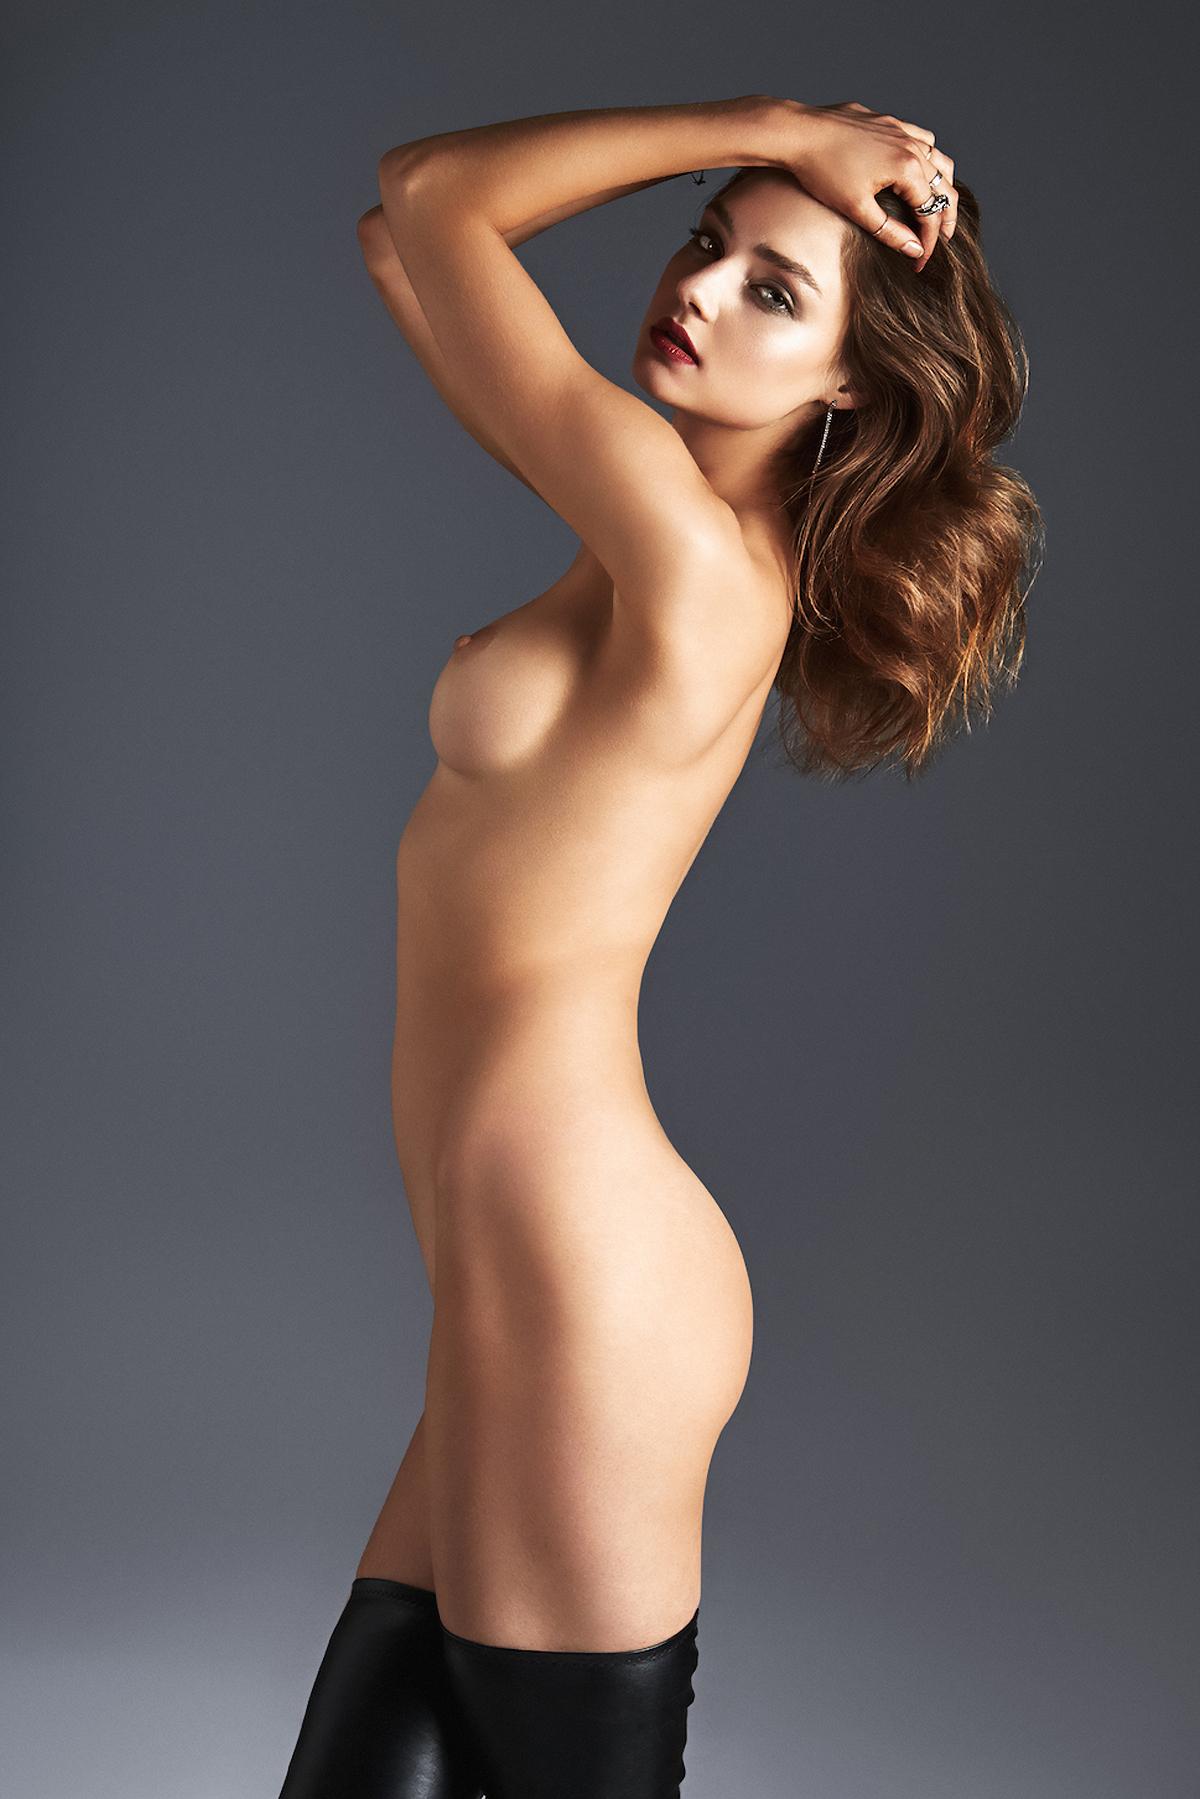 related items anvar norov photoshoot topless vika levina vika